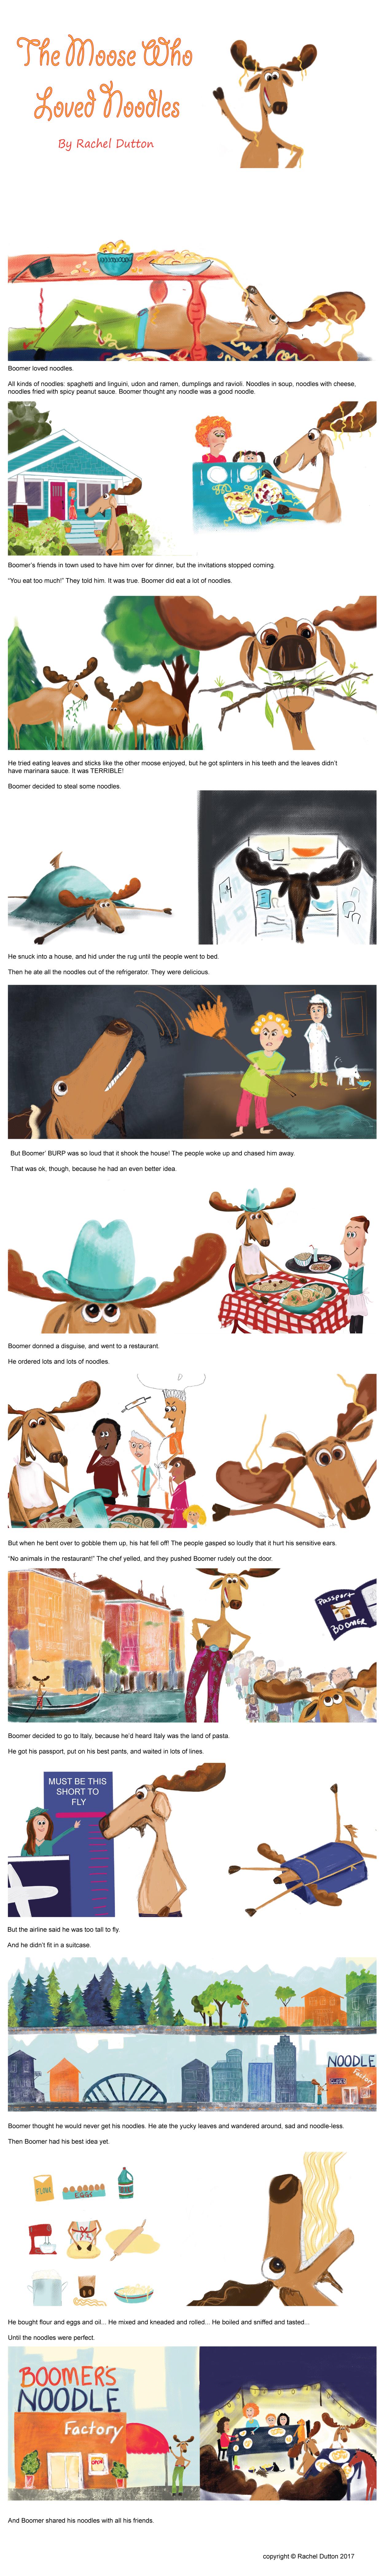 The-Moose-who-Loved-Noodles-2.jpg